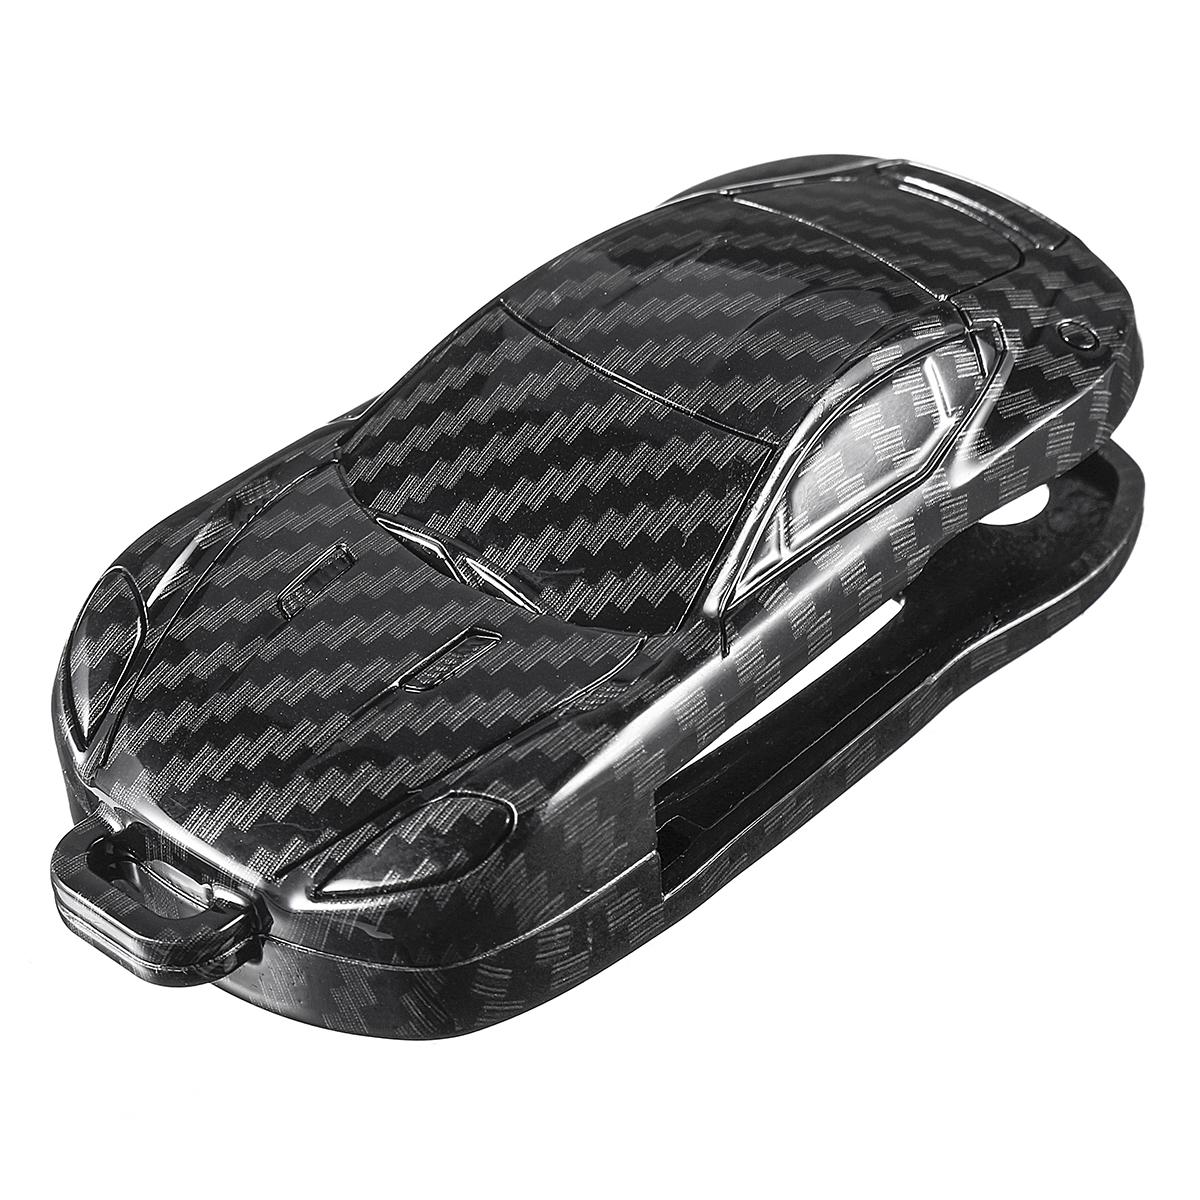 Carbon Fiber Car Key Case/bag Protector Cover Remote Control Bag for VW Golf Bora Jetta POLO Passat